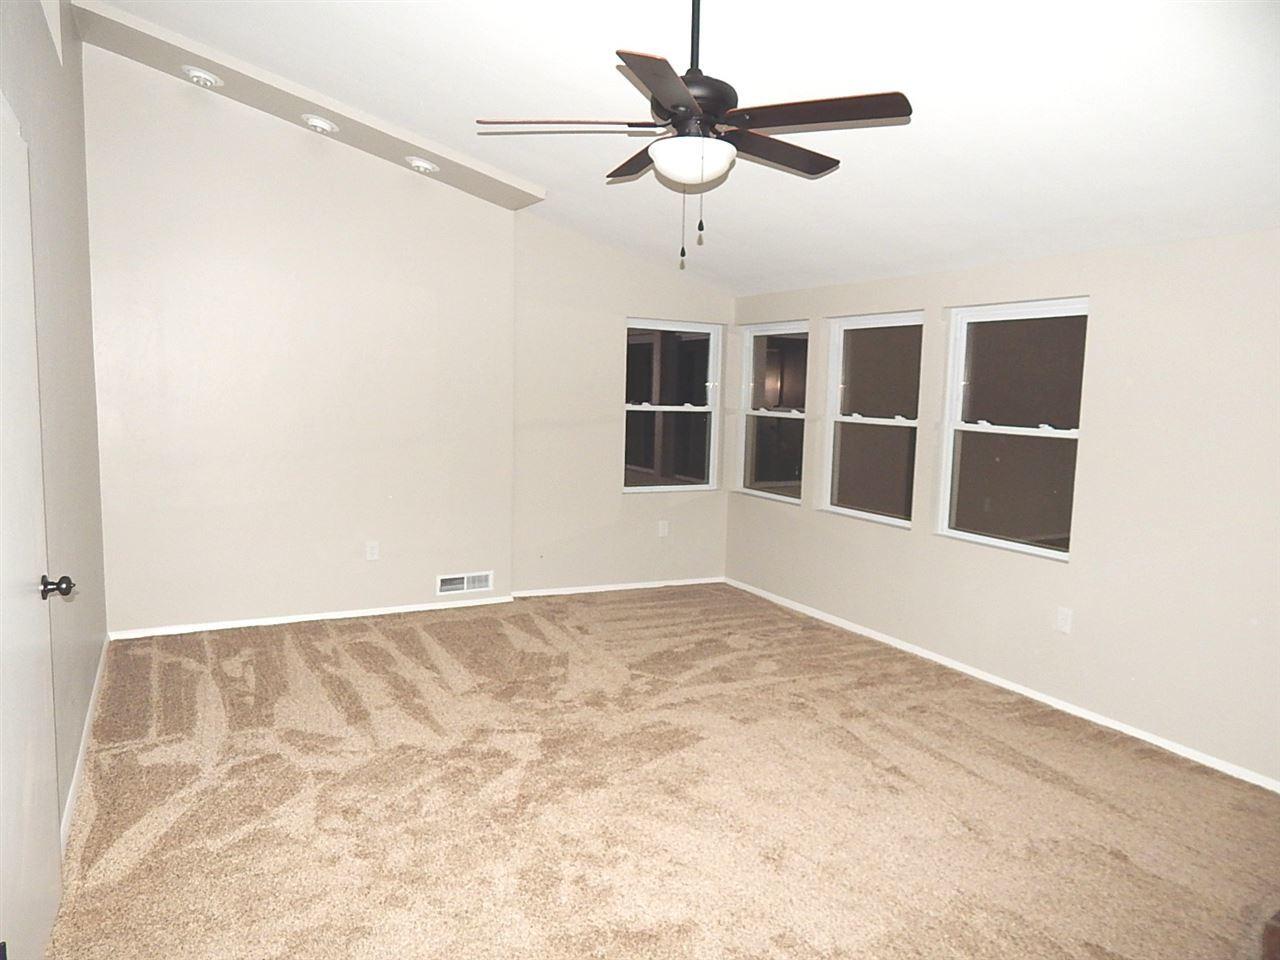 Sold Cross Sale W/ MLS | 1604 Blackard Ponca City, OK 74604 17